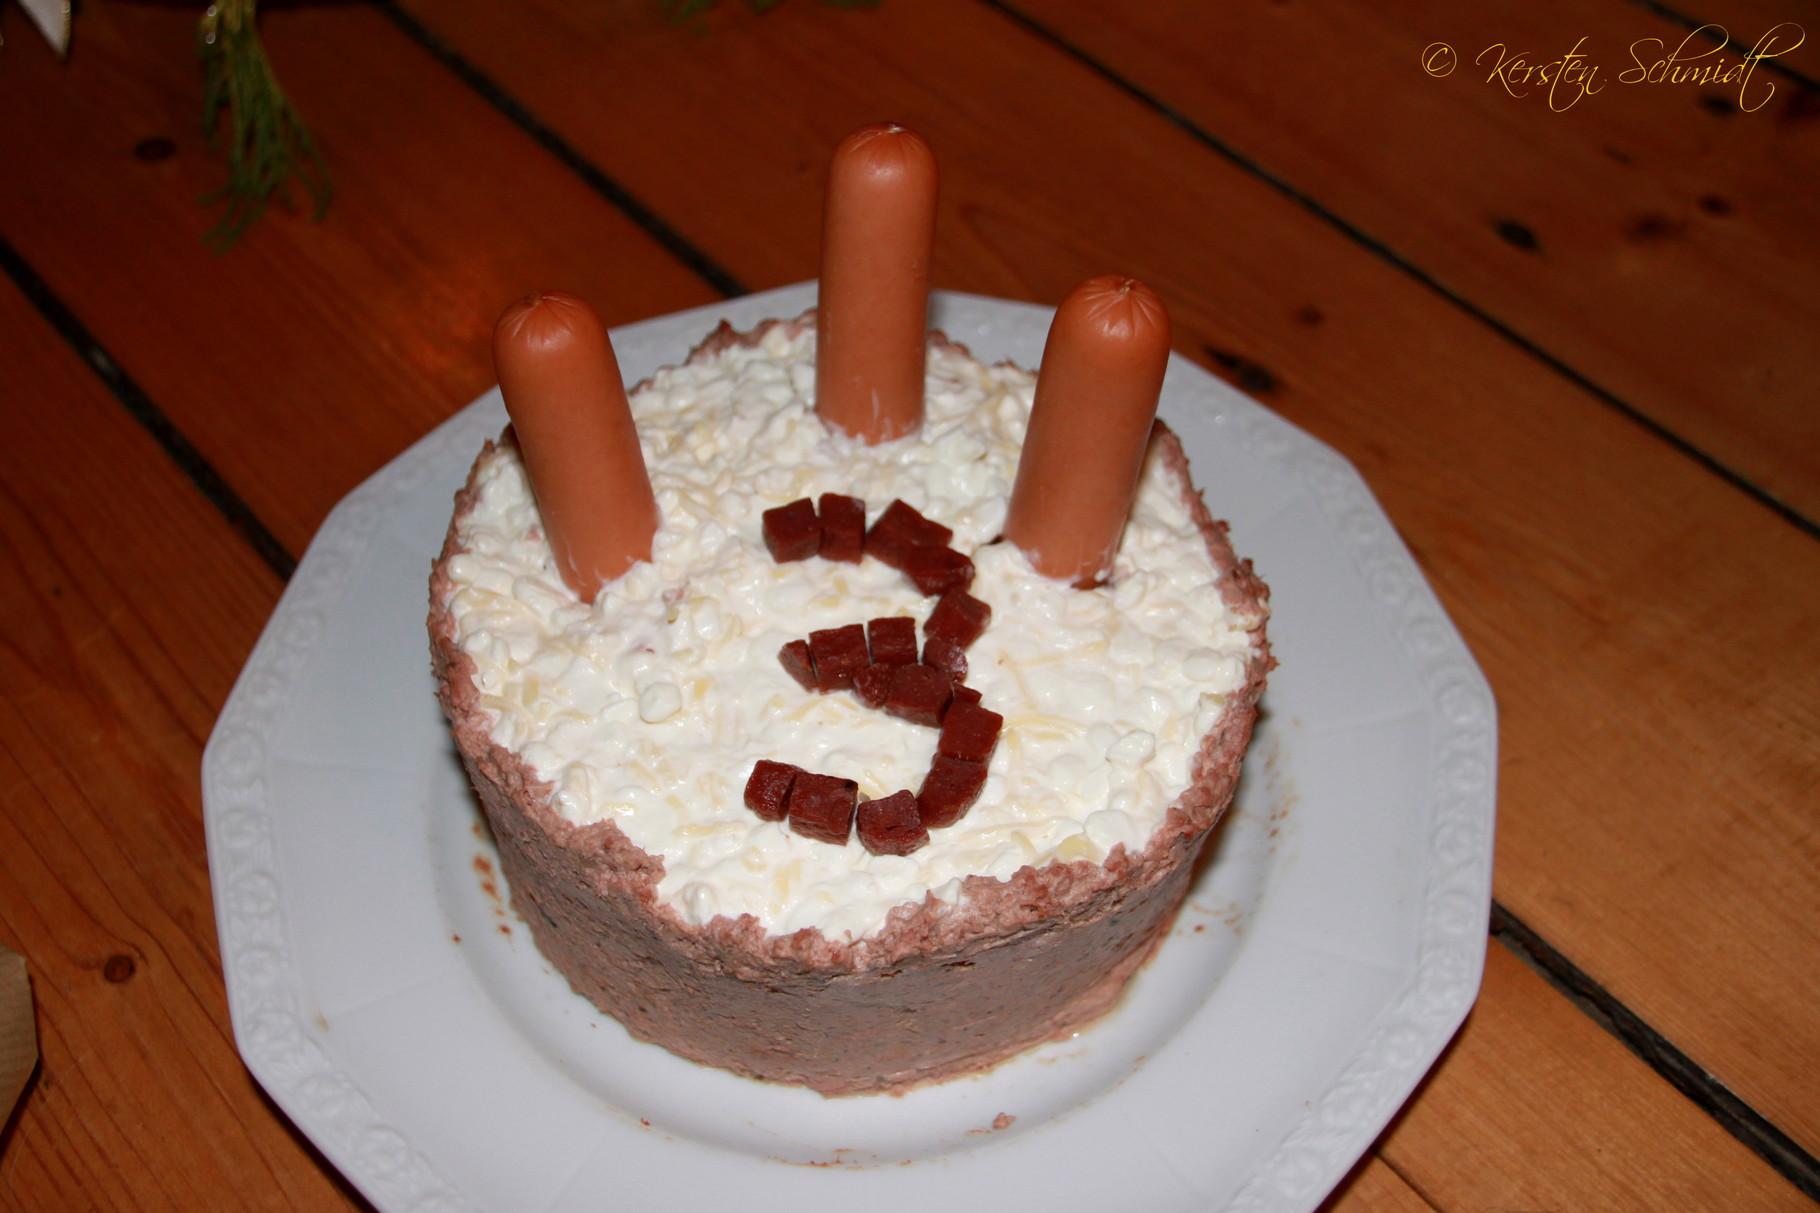 Sah die Torte nicht klasse aus???